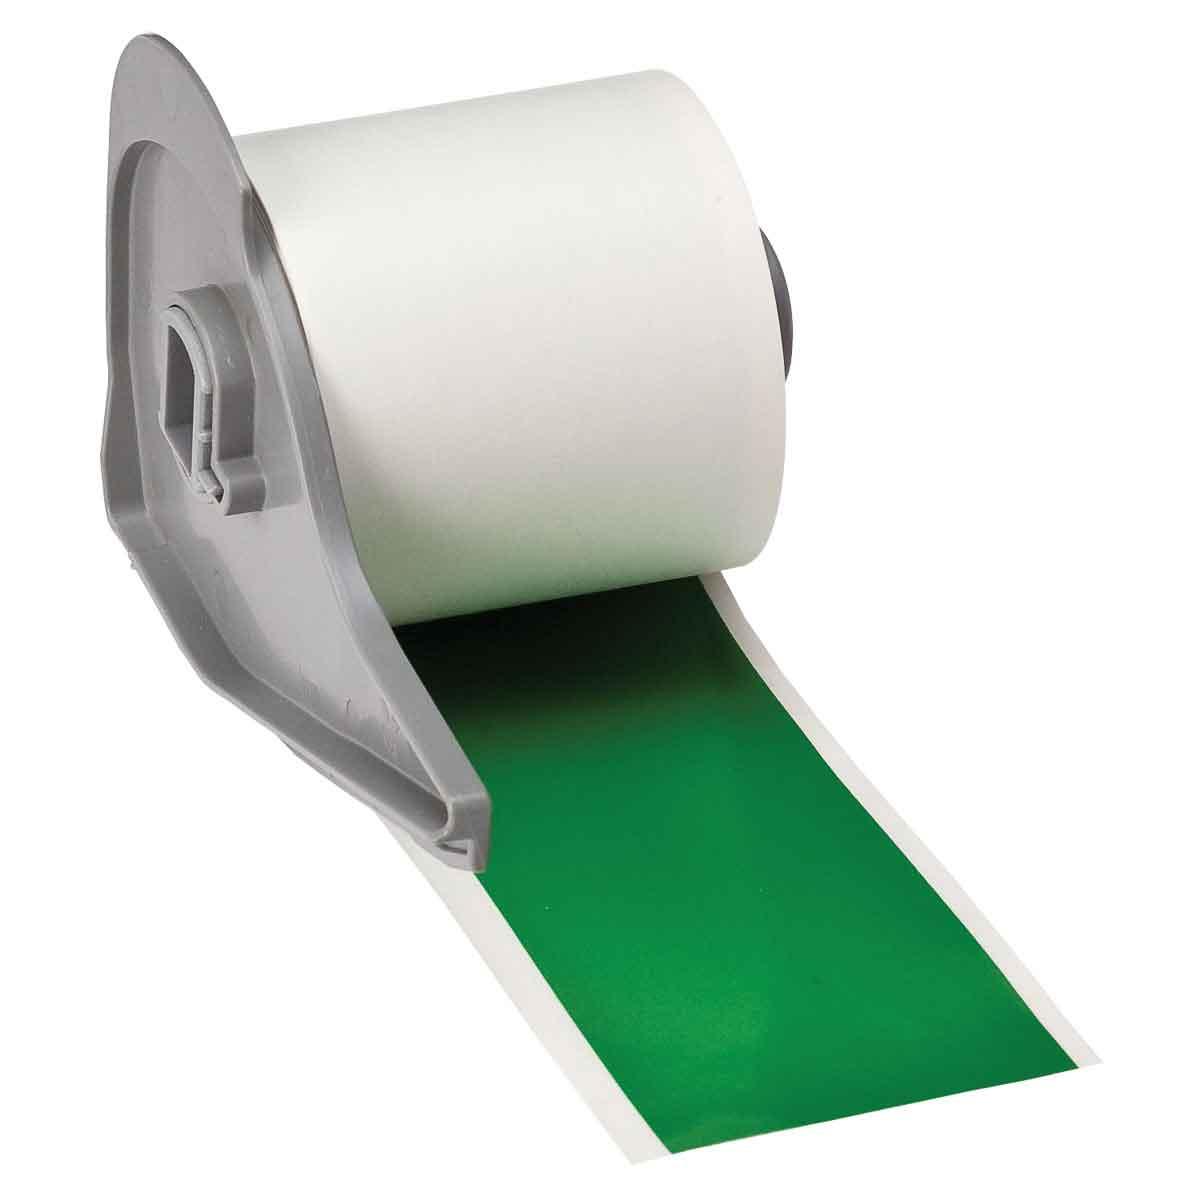 Brady® M71C-2000-595-GN Blank Thermal Transfer Tape, 50 ft L x 2 in W, Green, B-595 Vinyl, Permanent Acrylic Adhesive, -40 to 180 deg F